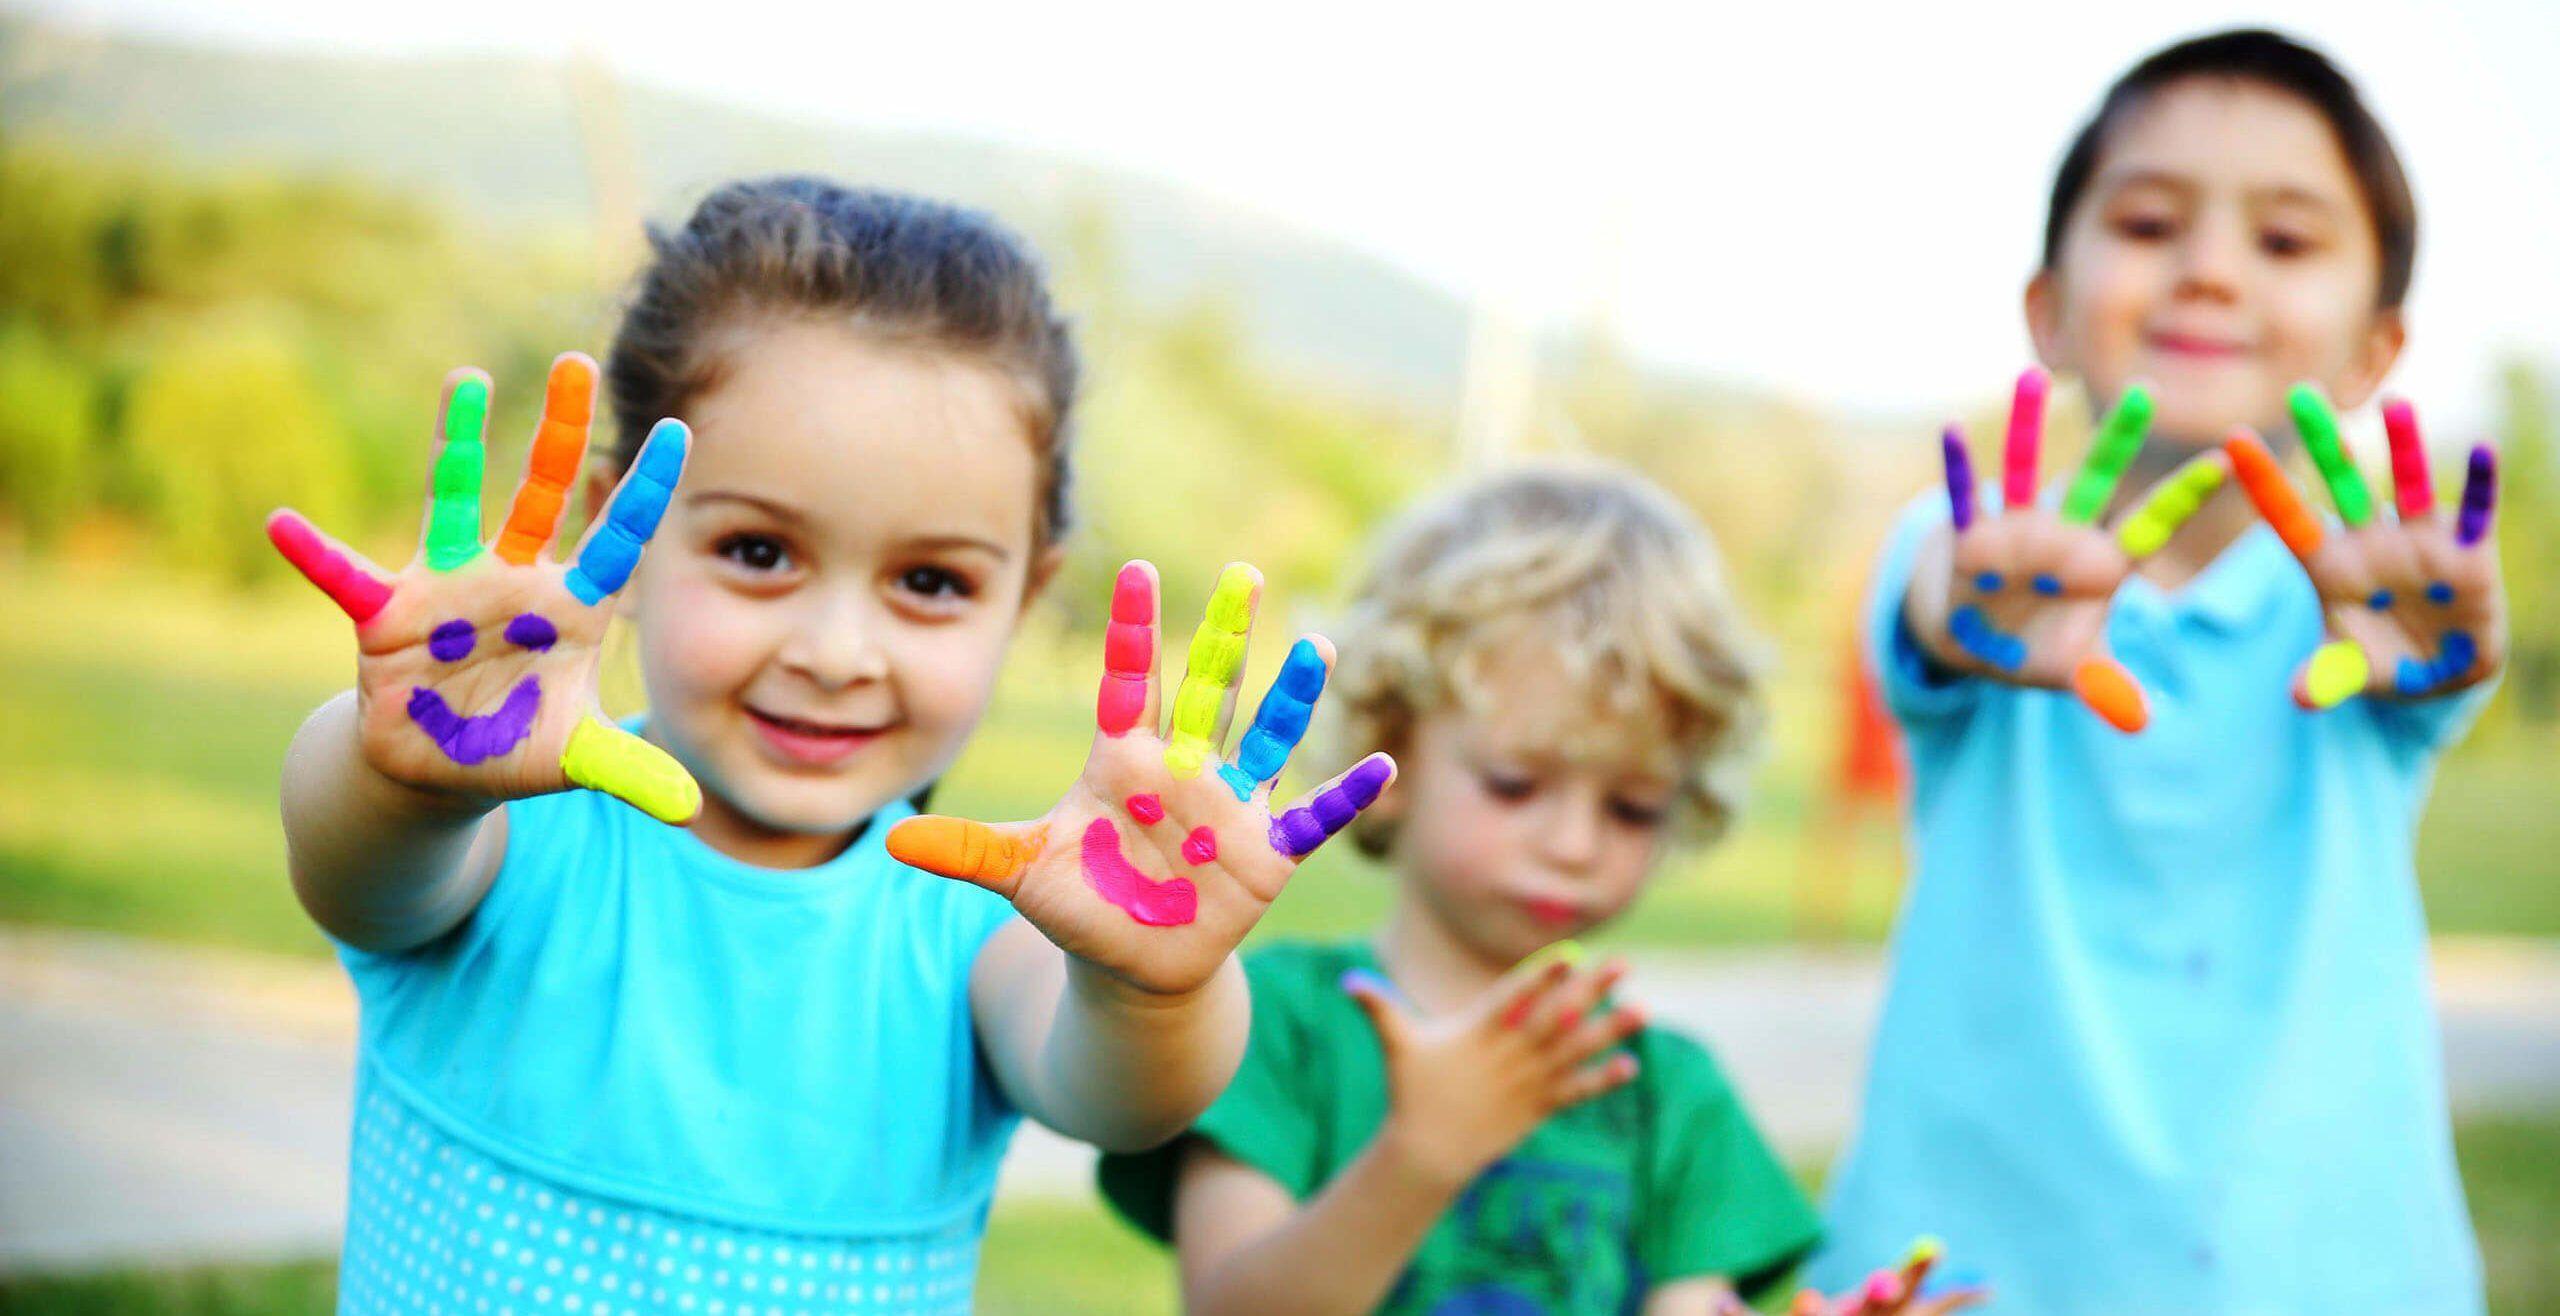 Green Apple Preschool in 2020 Education coordinator